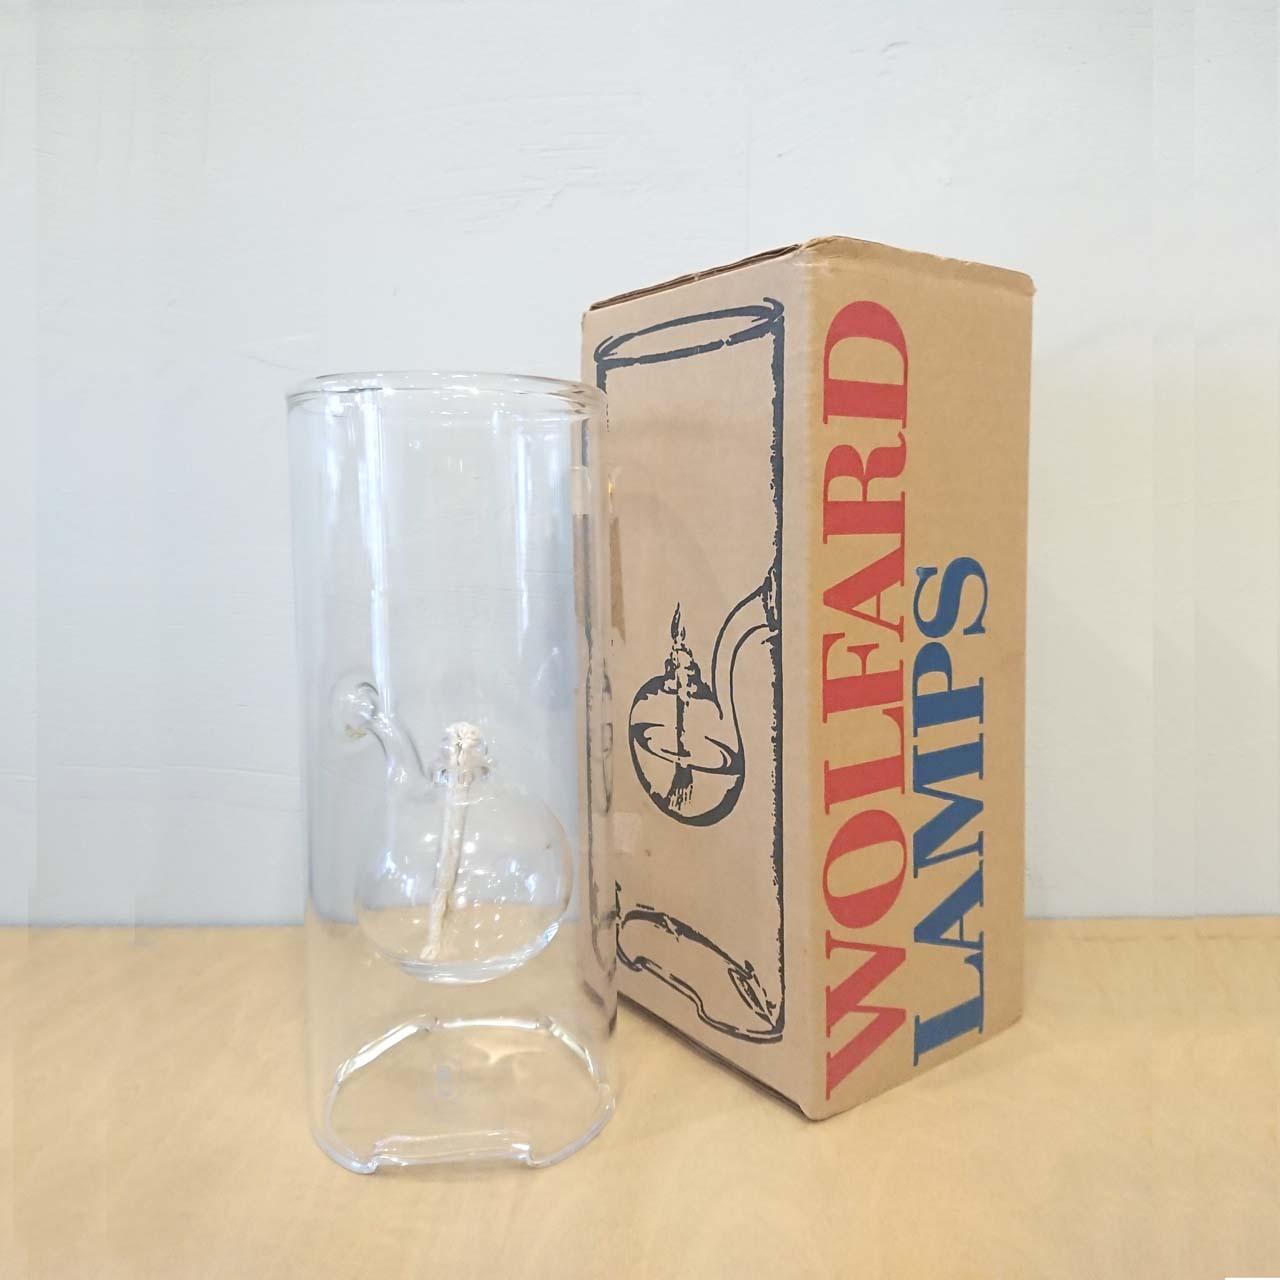 USA Wolfard Glassblowing Co.Inc. クラシックオイルランプ 23cm 箱付 美品 ビンテージ